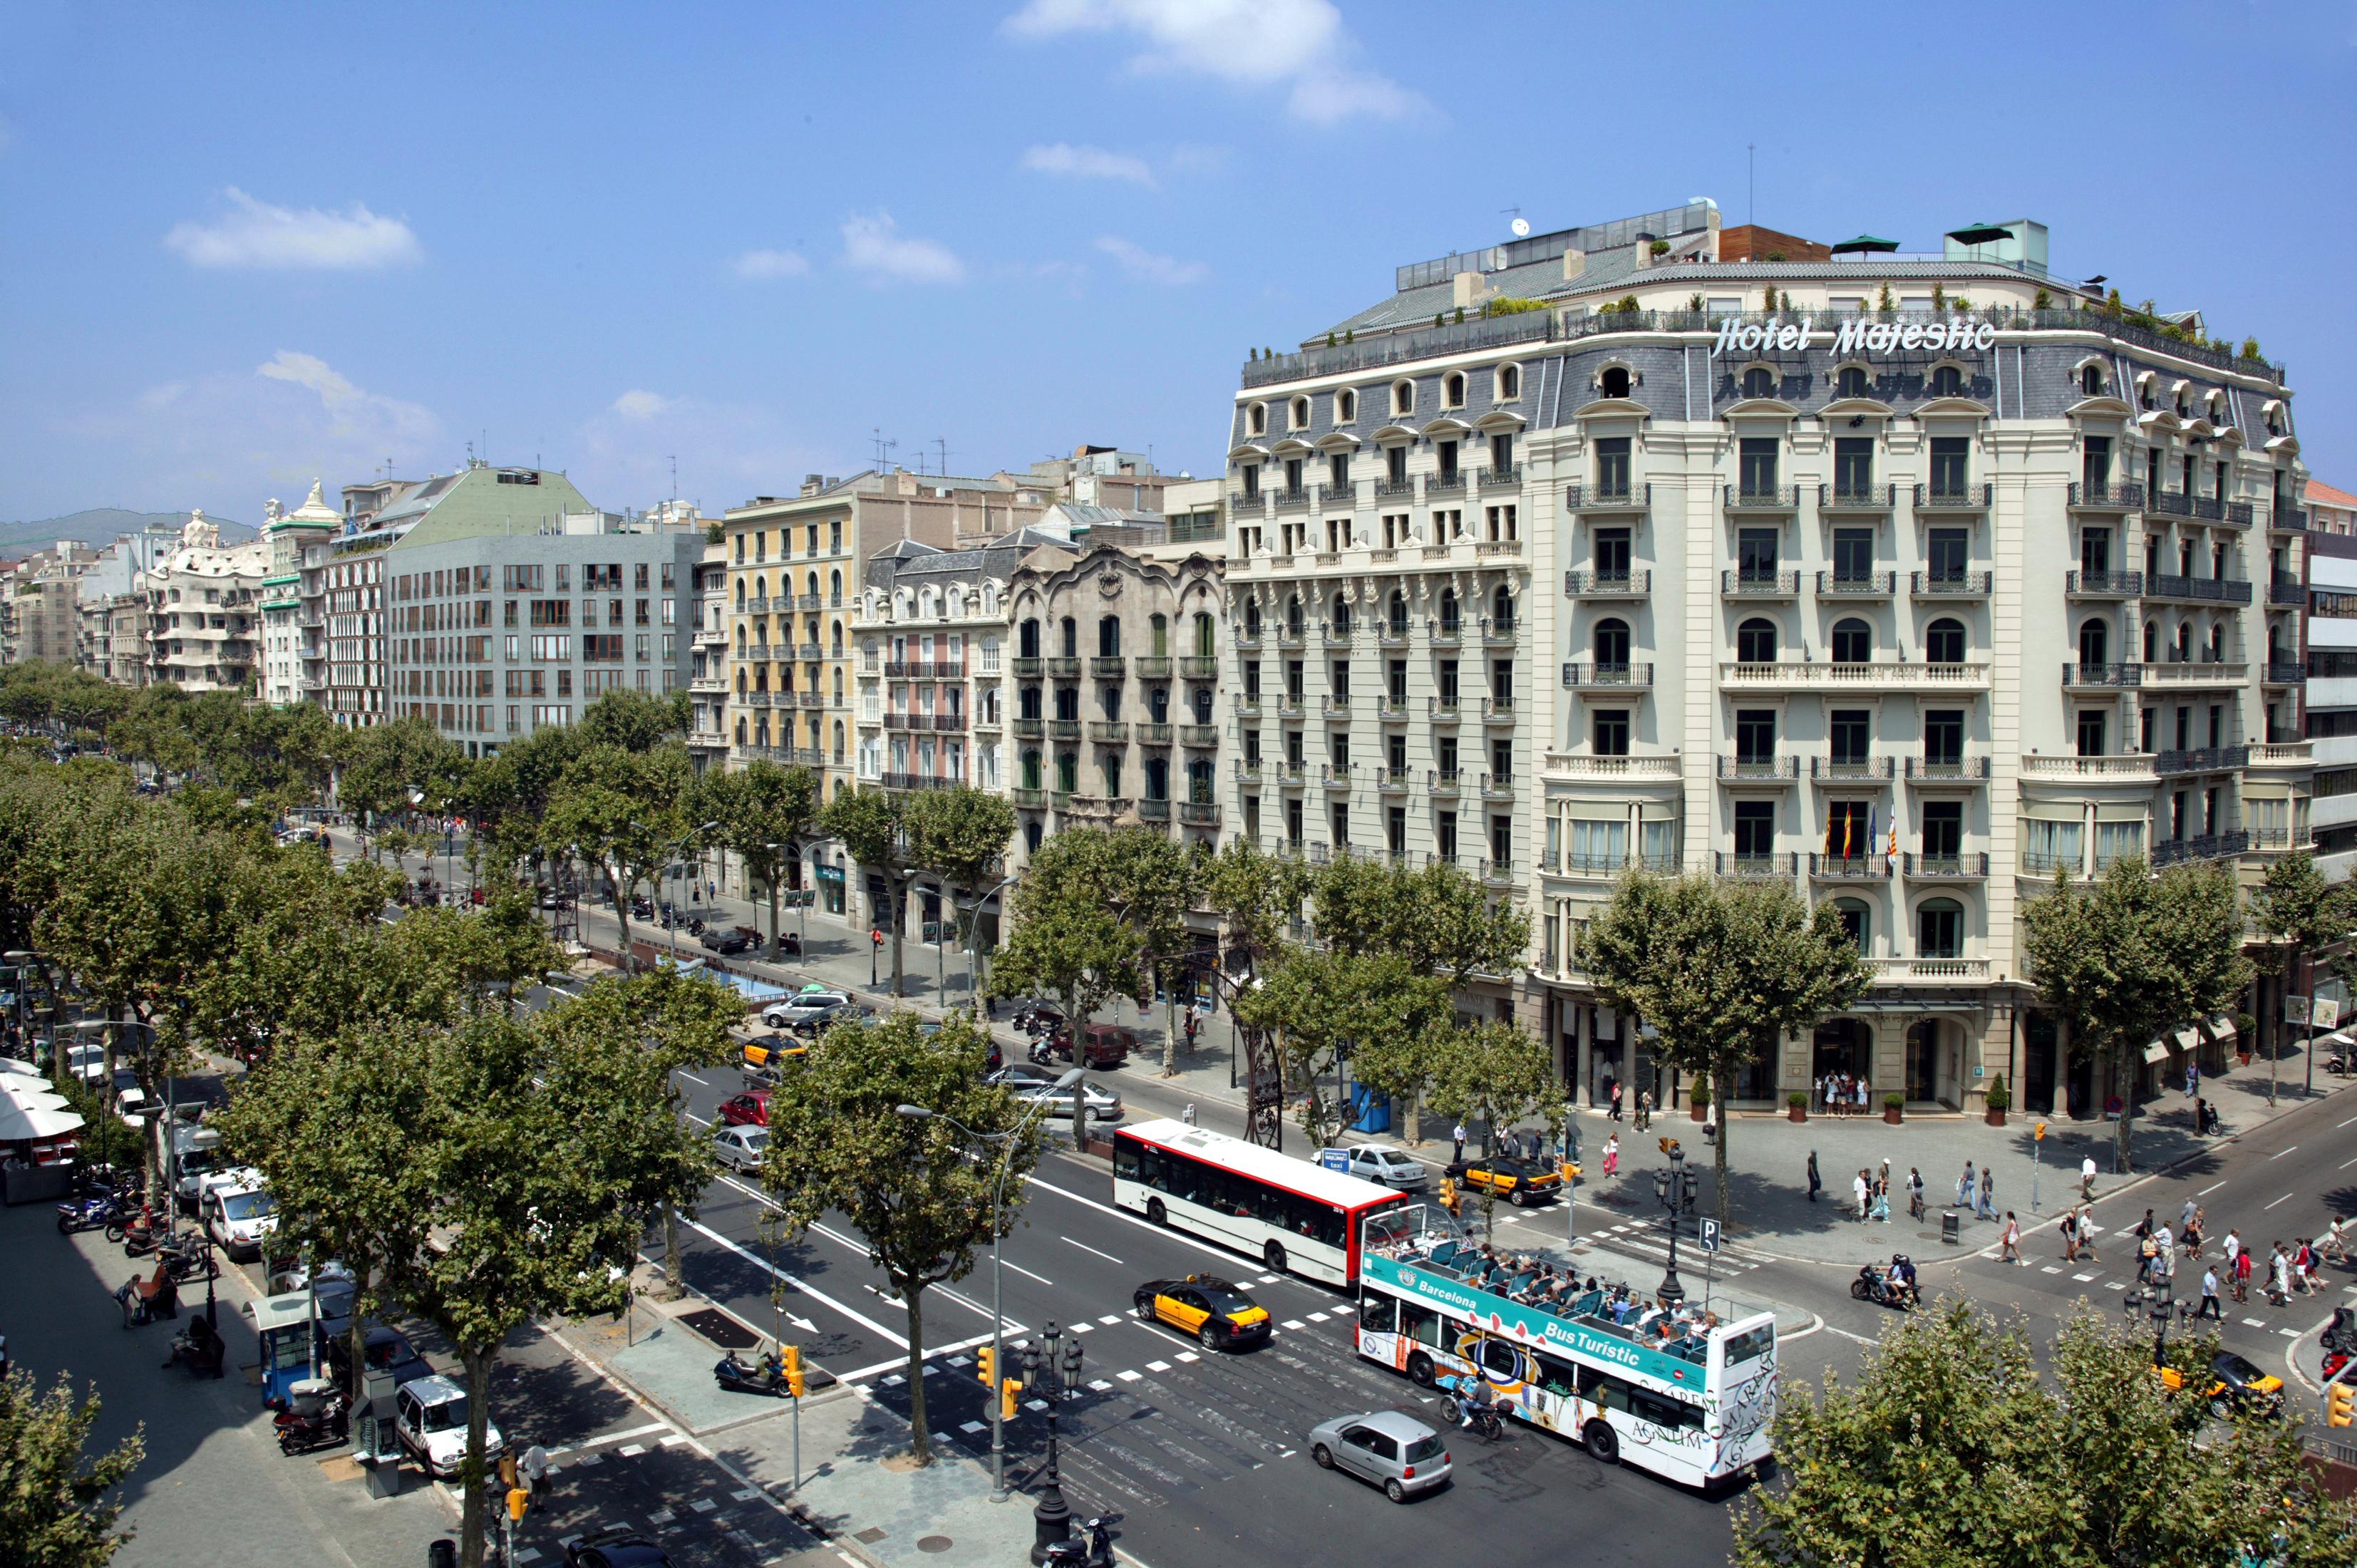 Gràcia - недвижимость в районе Грасия в Барселоне